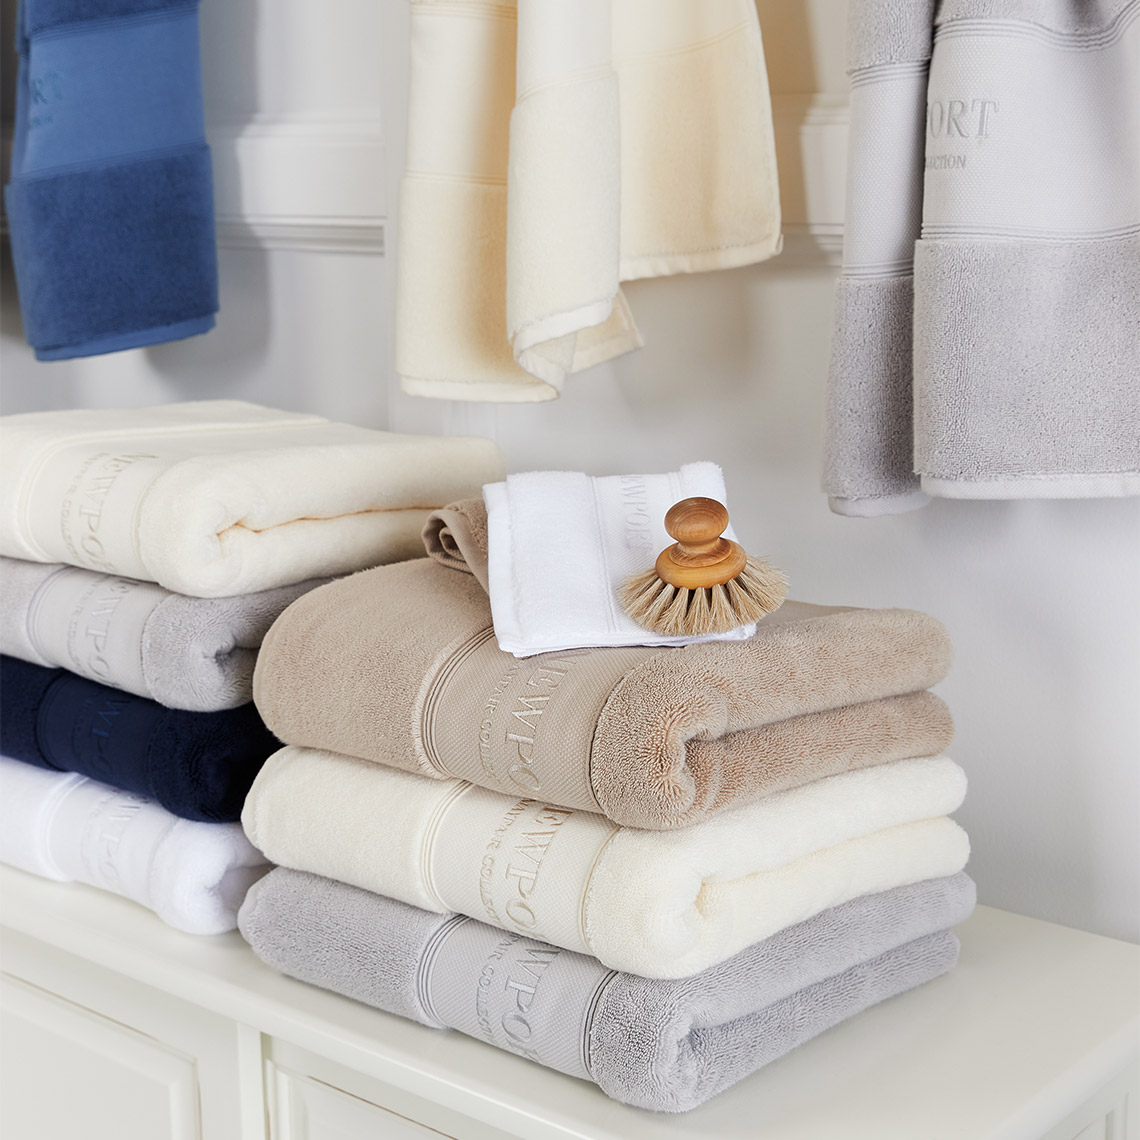 Mayfair Collection - Newports mest exklusiva serie handdukar